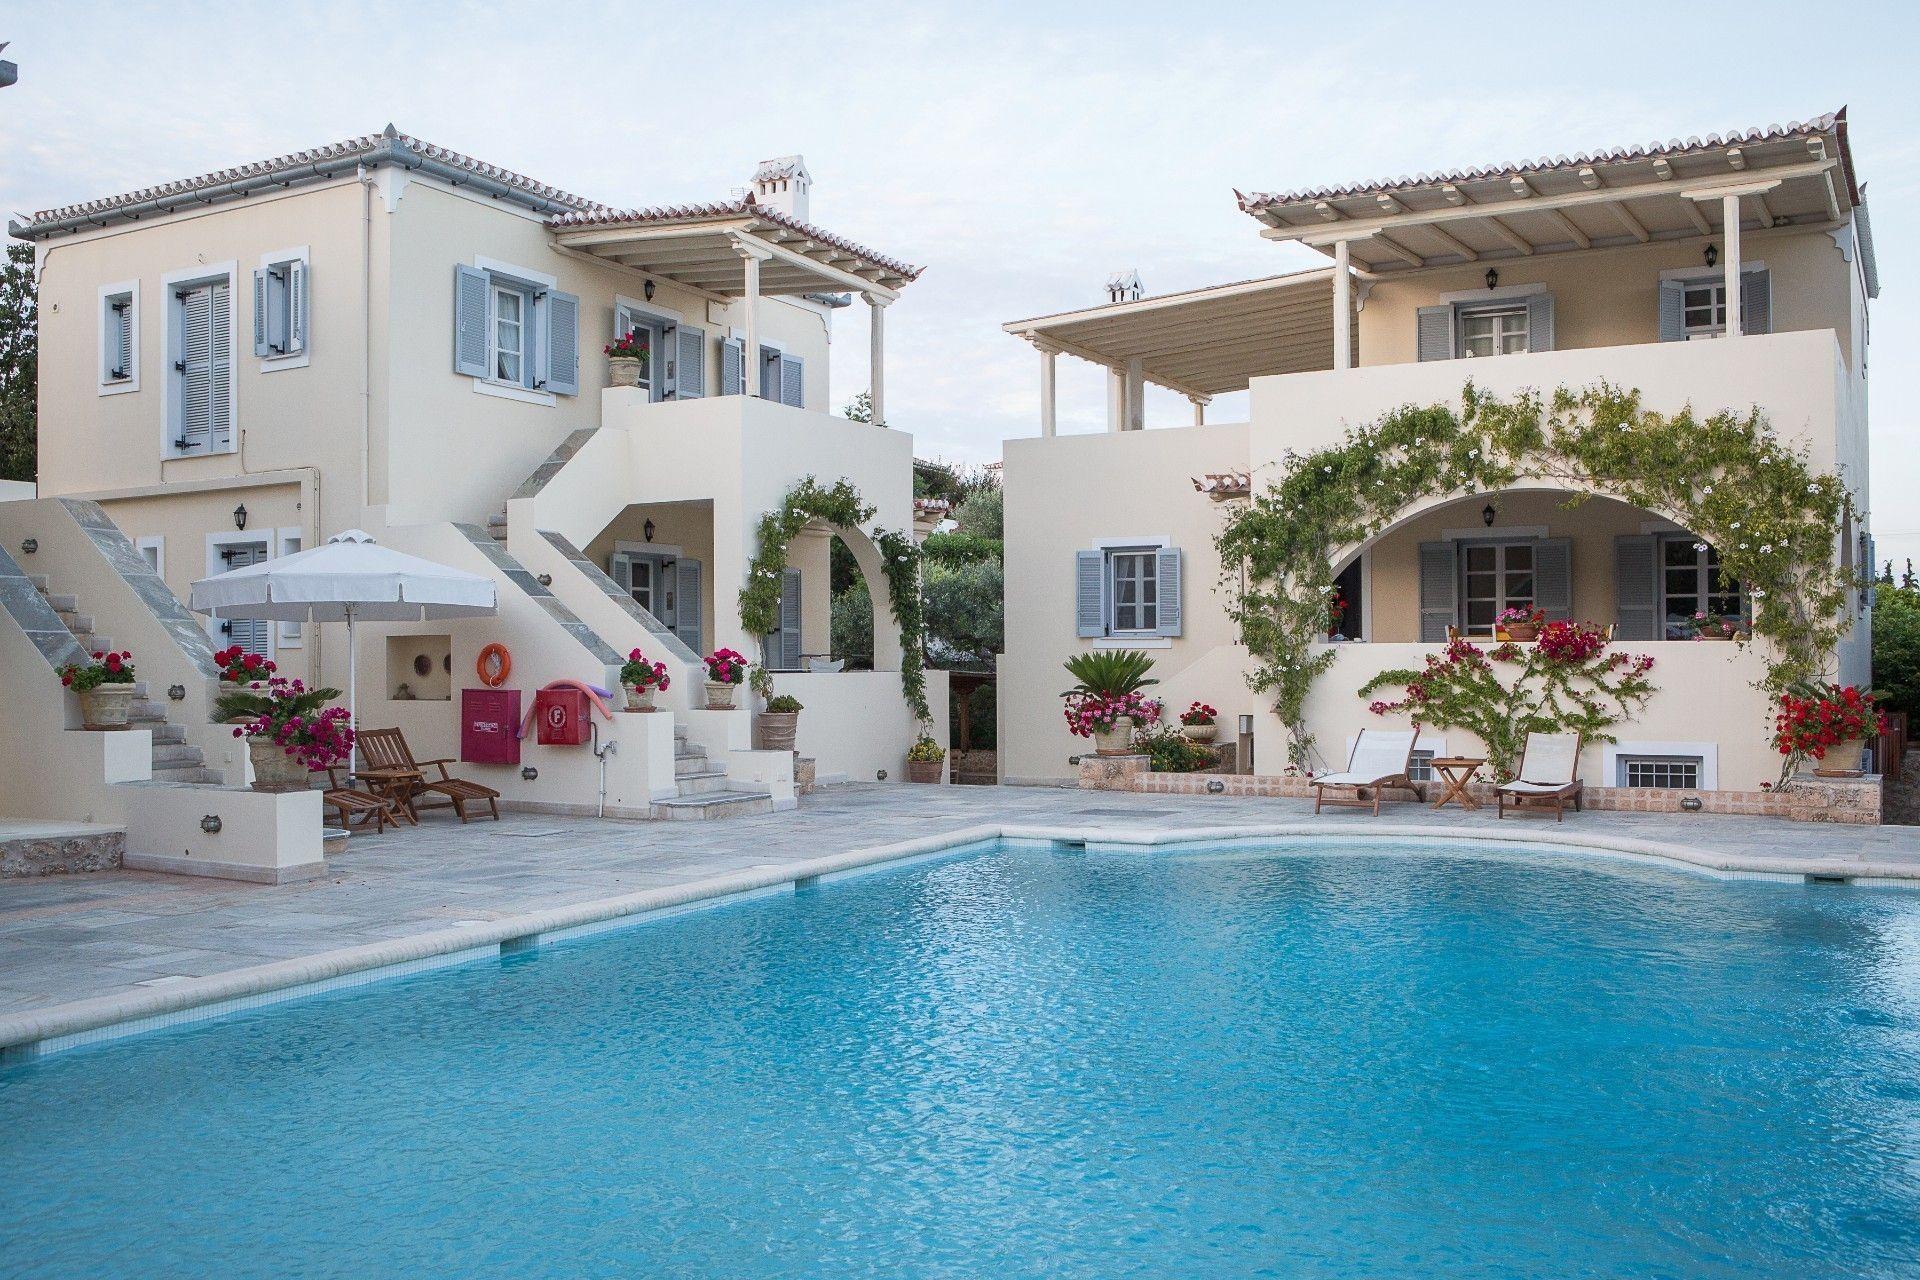 Villa Nika Boutique Hotel - Σπέτσες ✦ -36% ✦ 3 Ημέρες